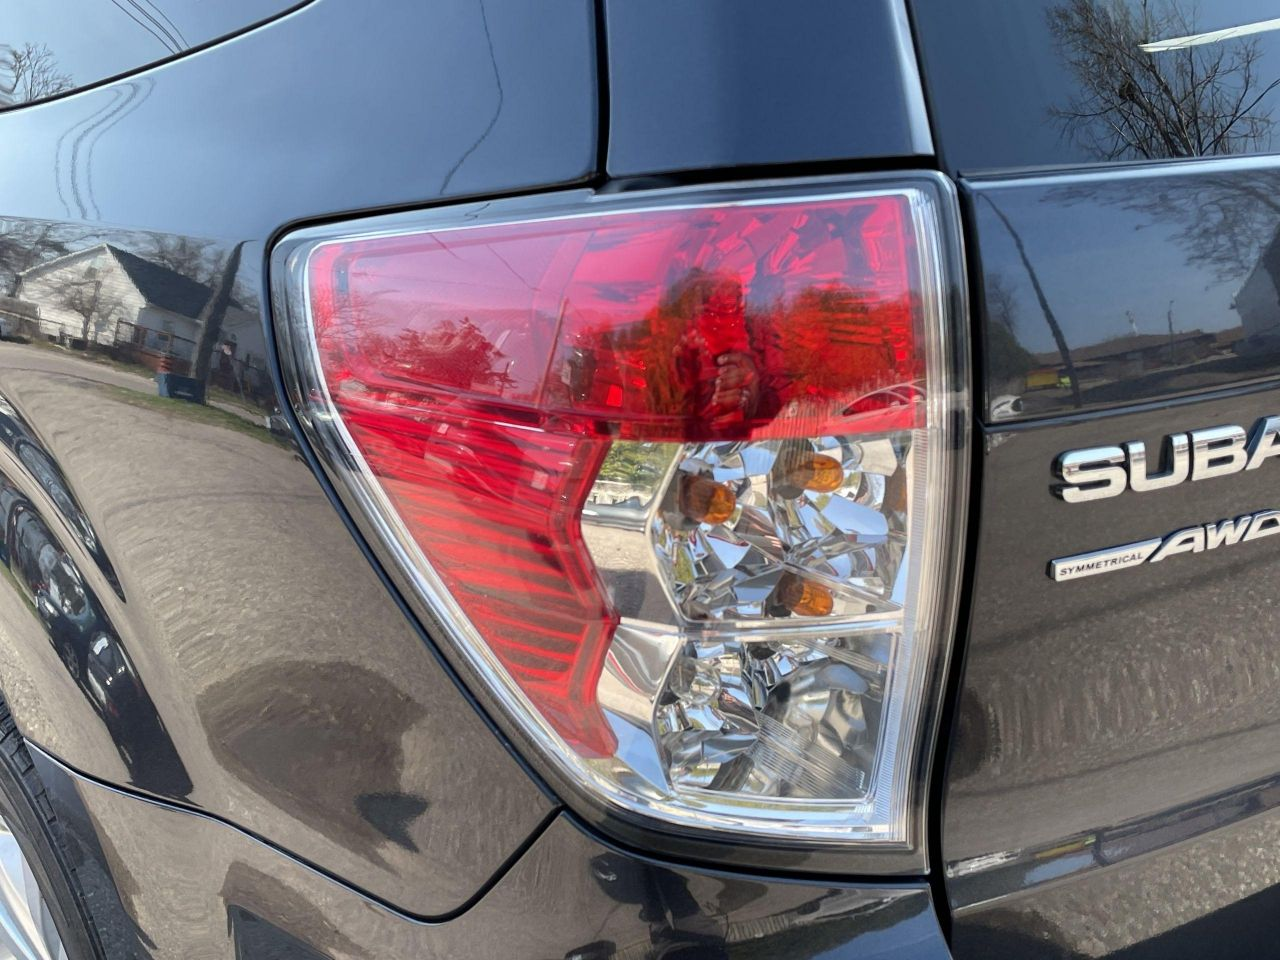 2012 Subaru Forester